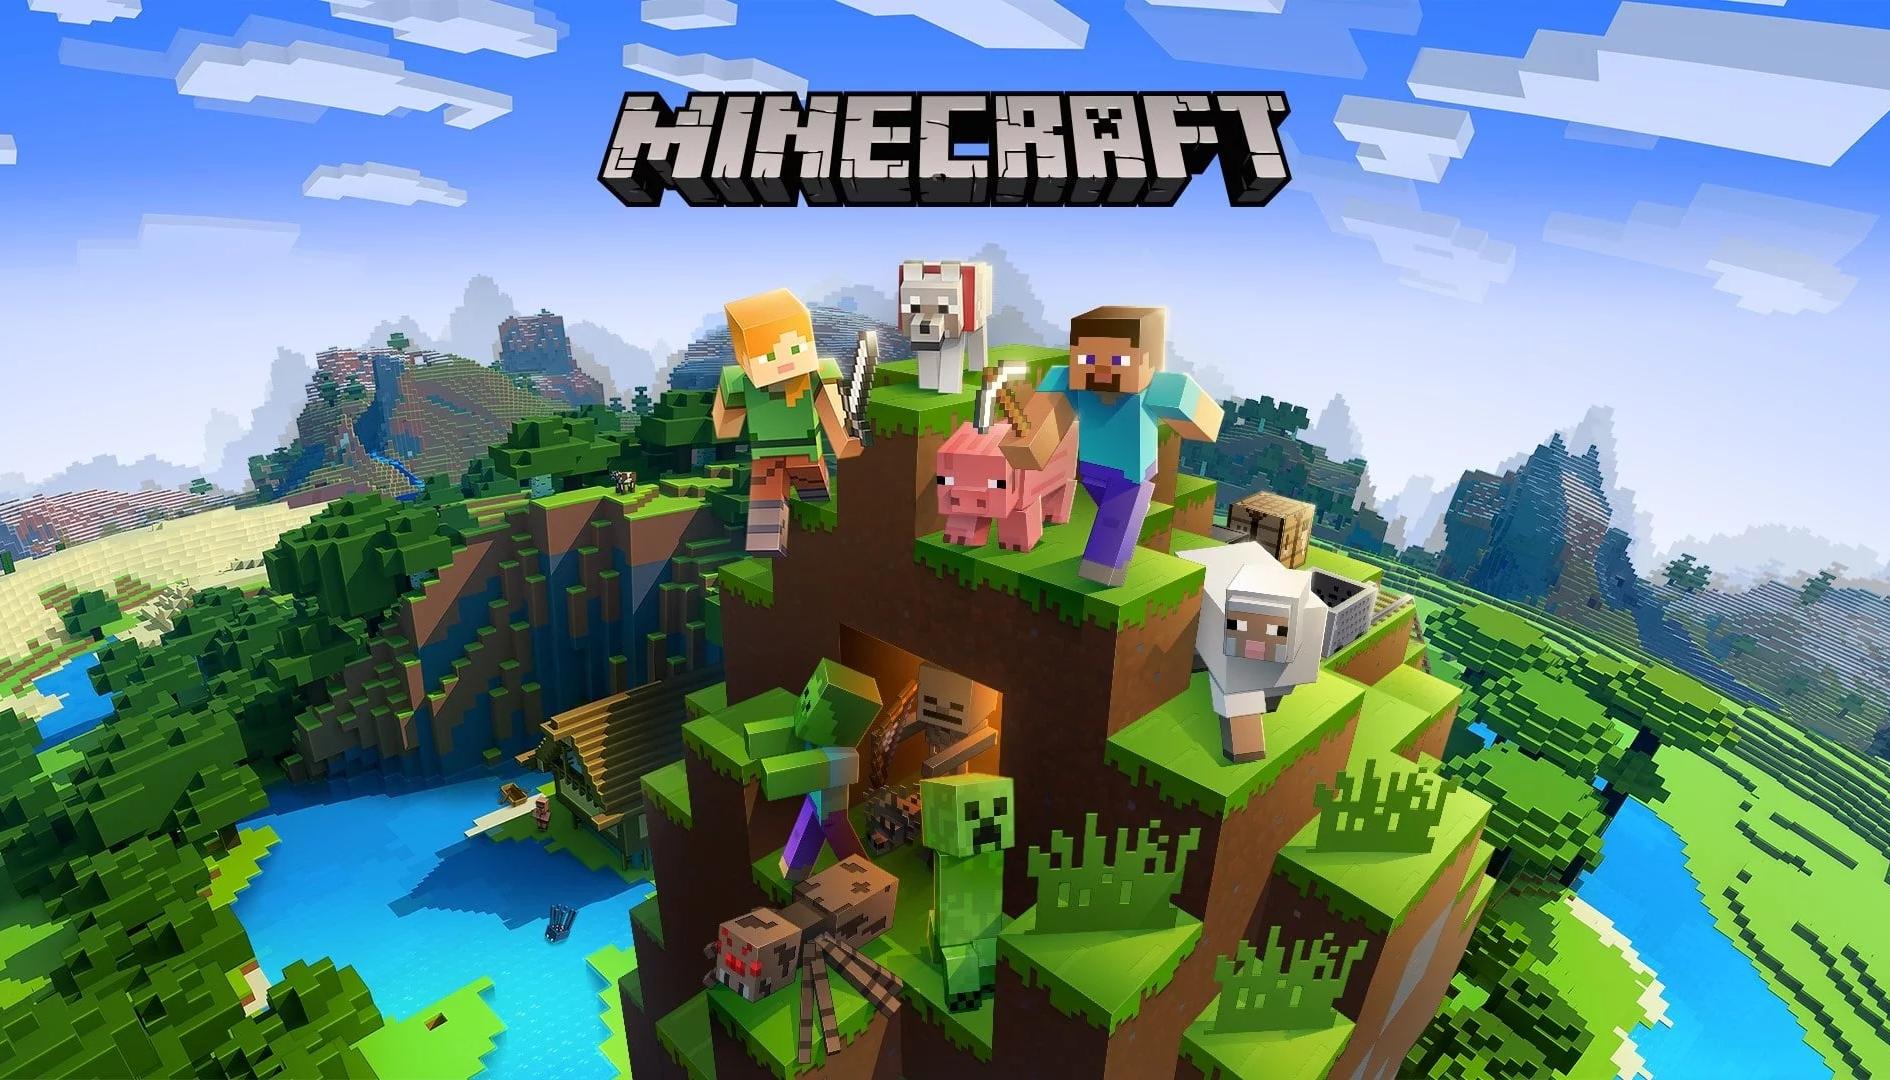 Minecraft, giocare a Link's Awakening grazie ad una mod